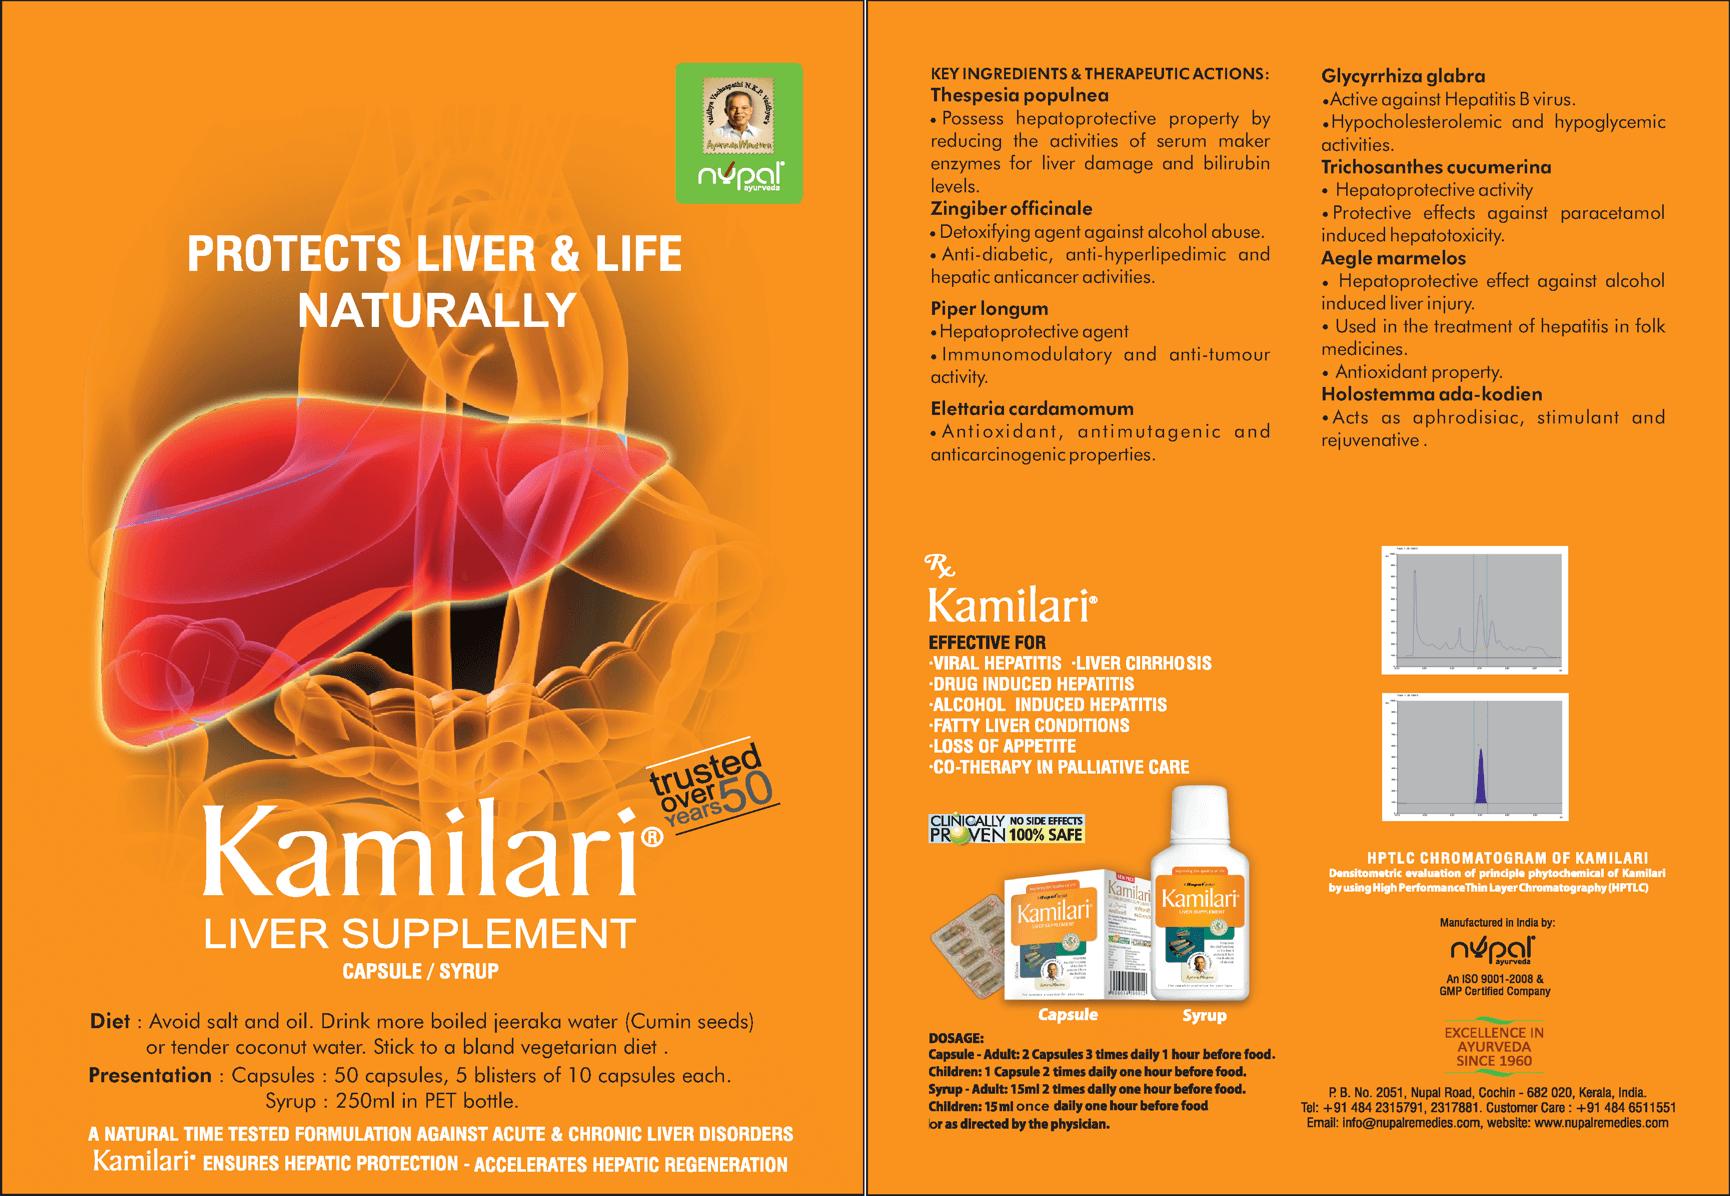 Камилари капсулы (kamilari Capsules, Nupal)